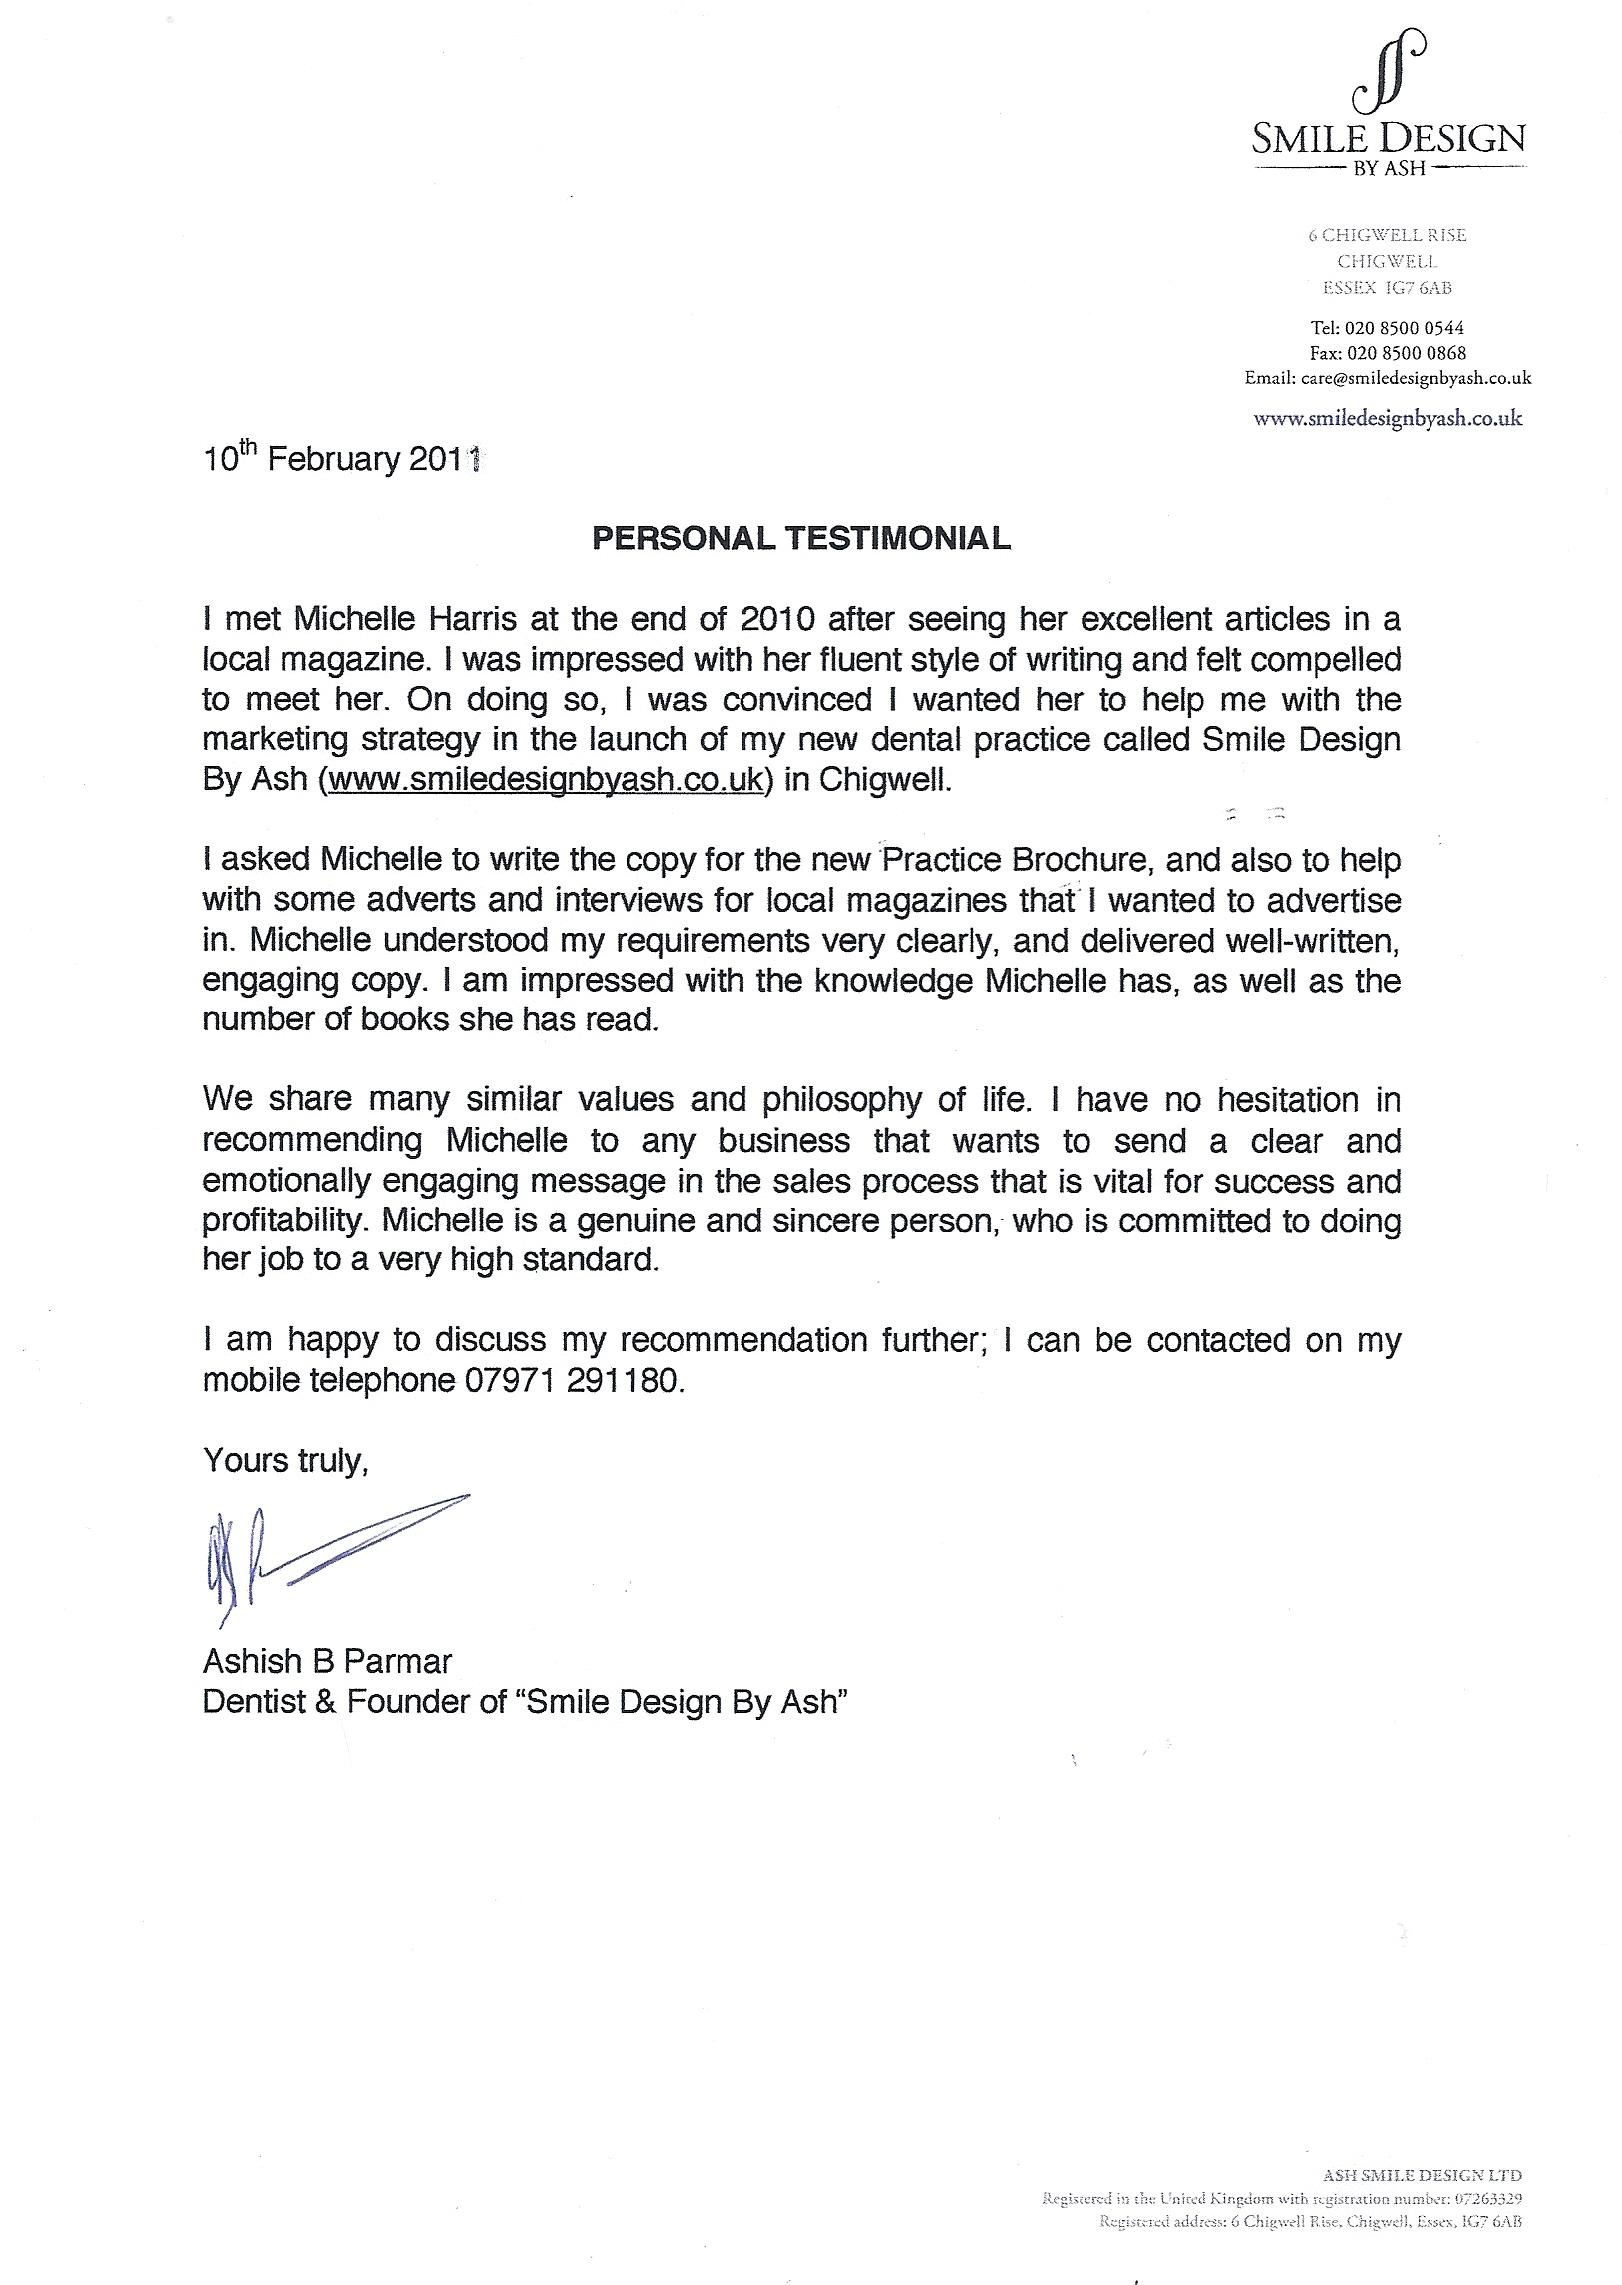 Testimonials star copywriting michelle harris ash parmar testimonial february 20112 thecheapjerseys Images